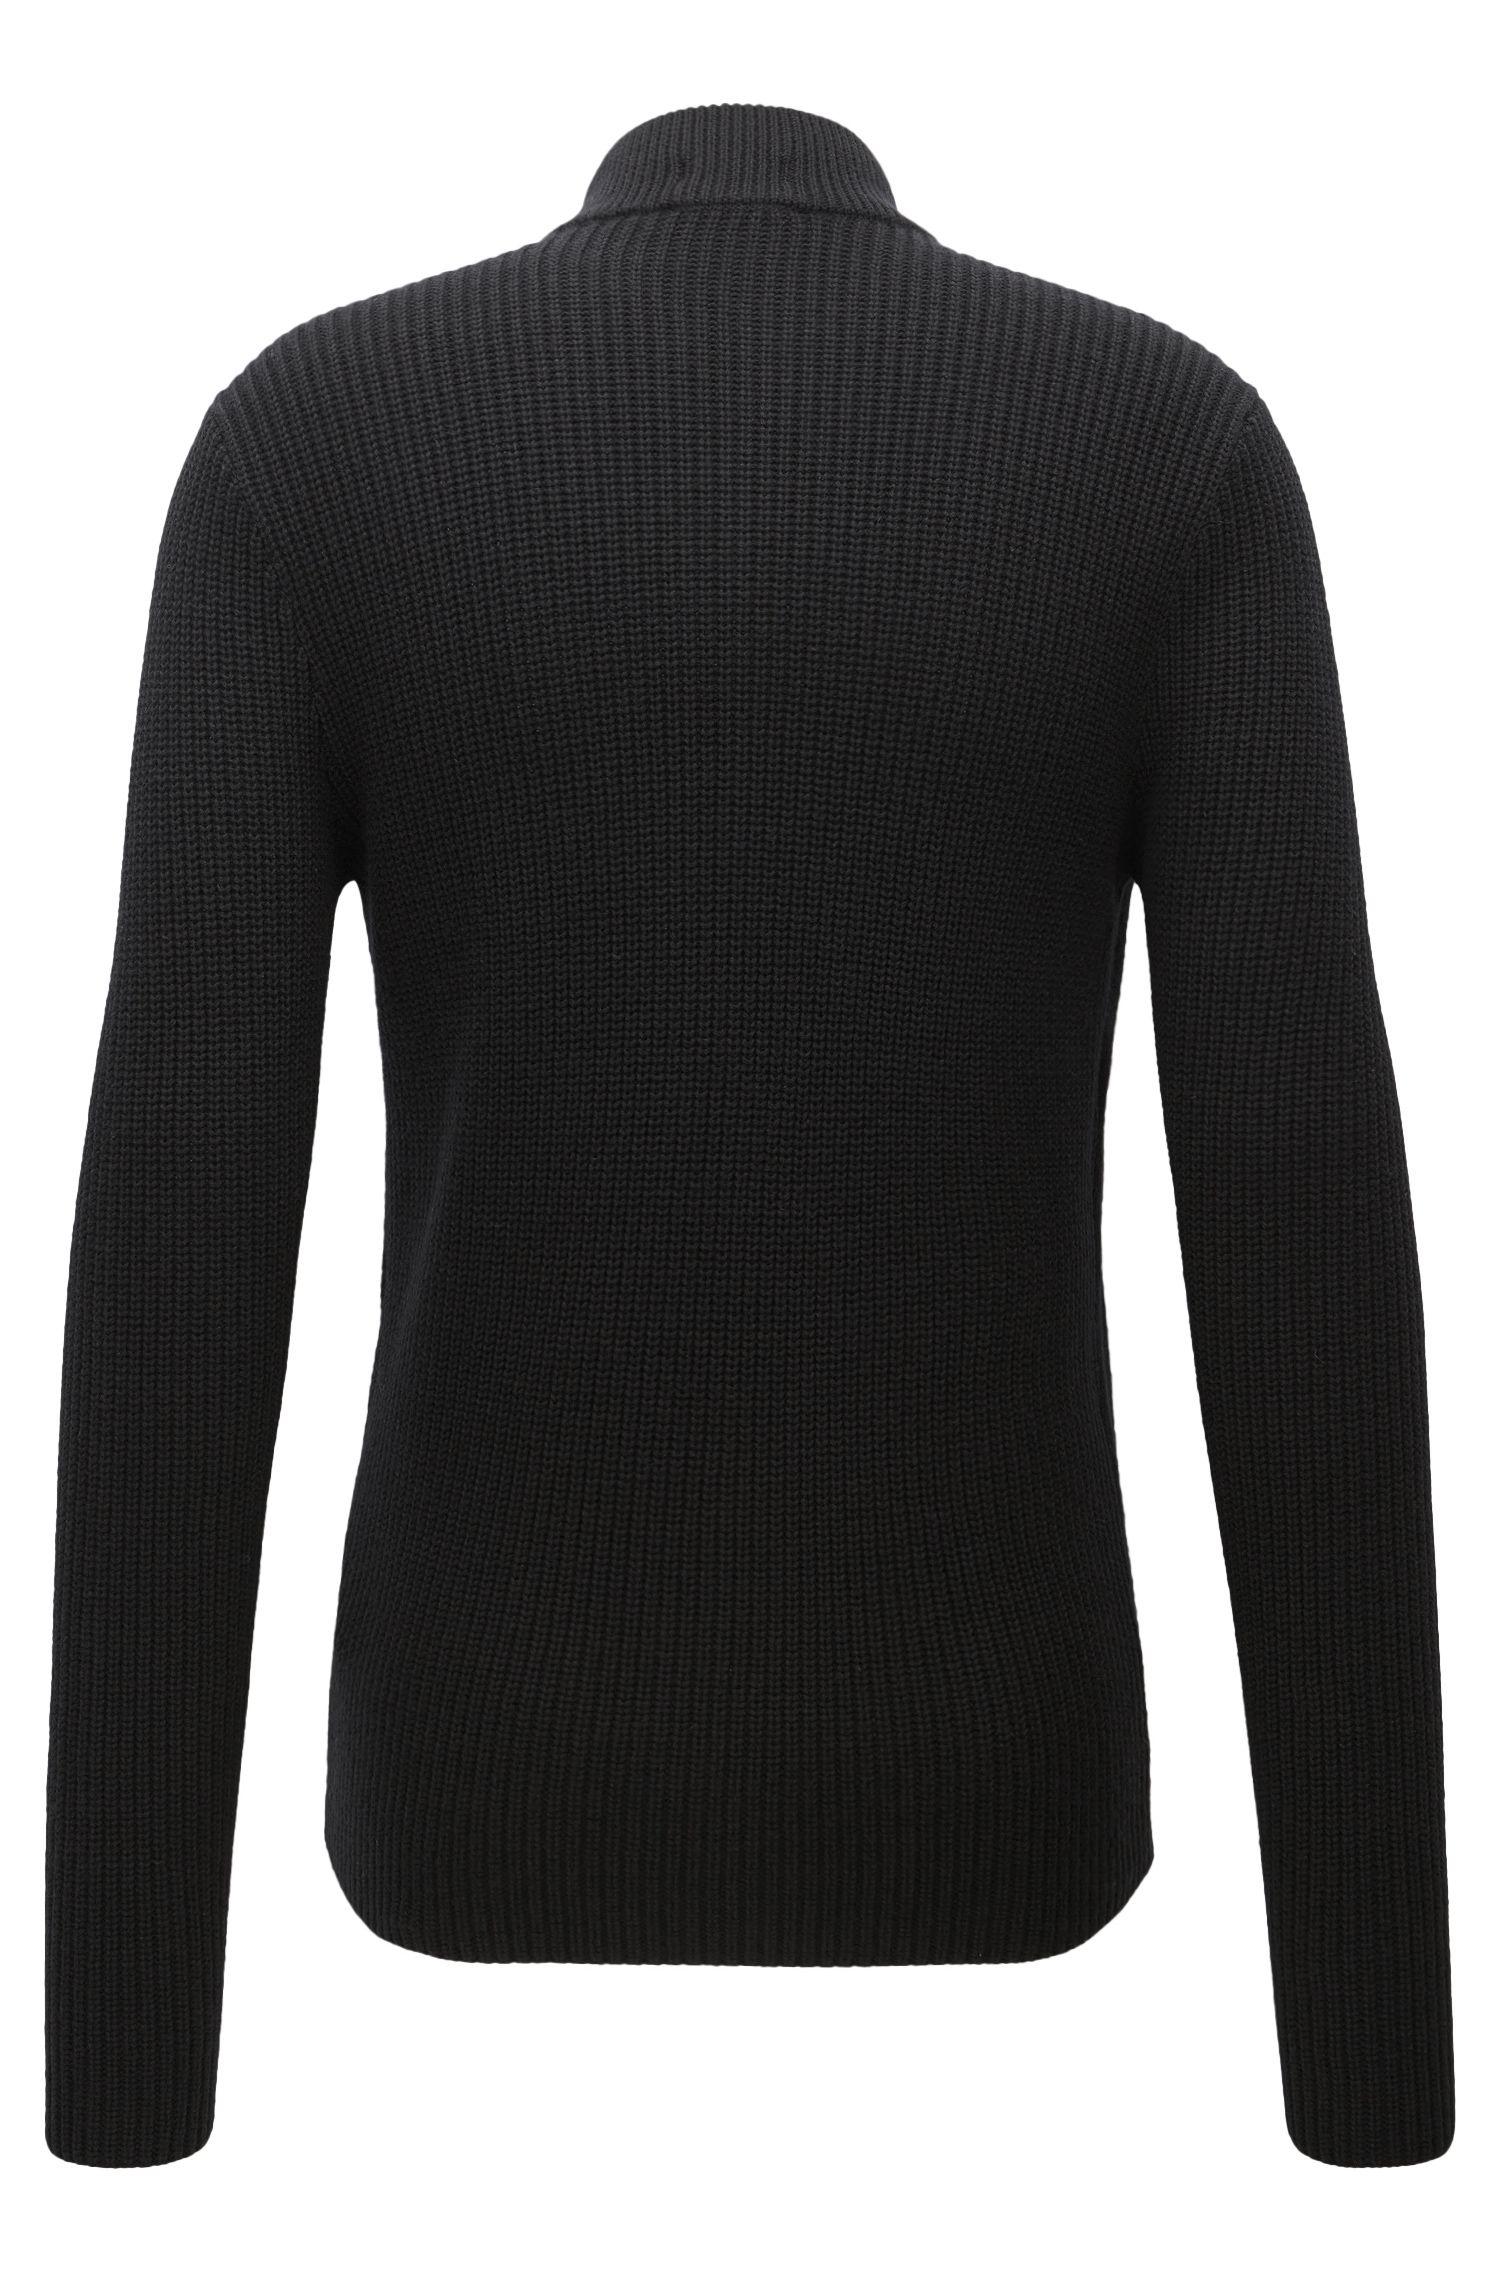 Cotton-Wool Full-Zip Jacket | Picetti